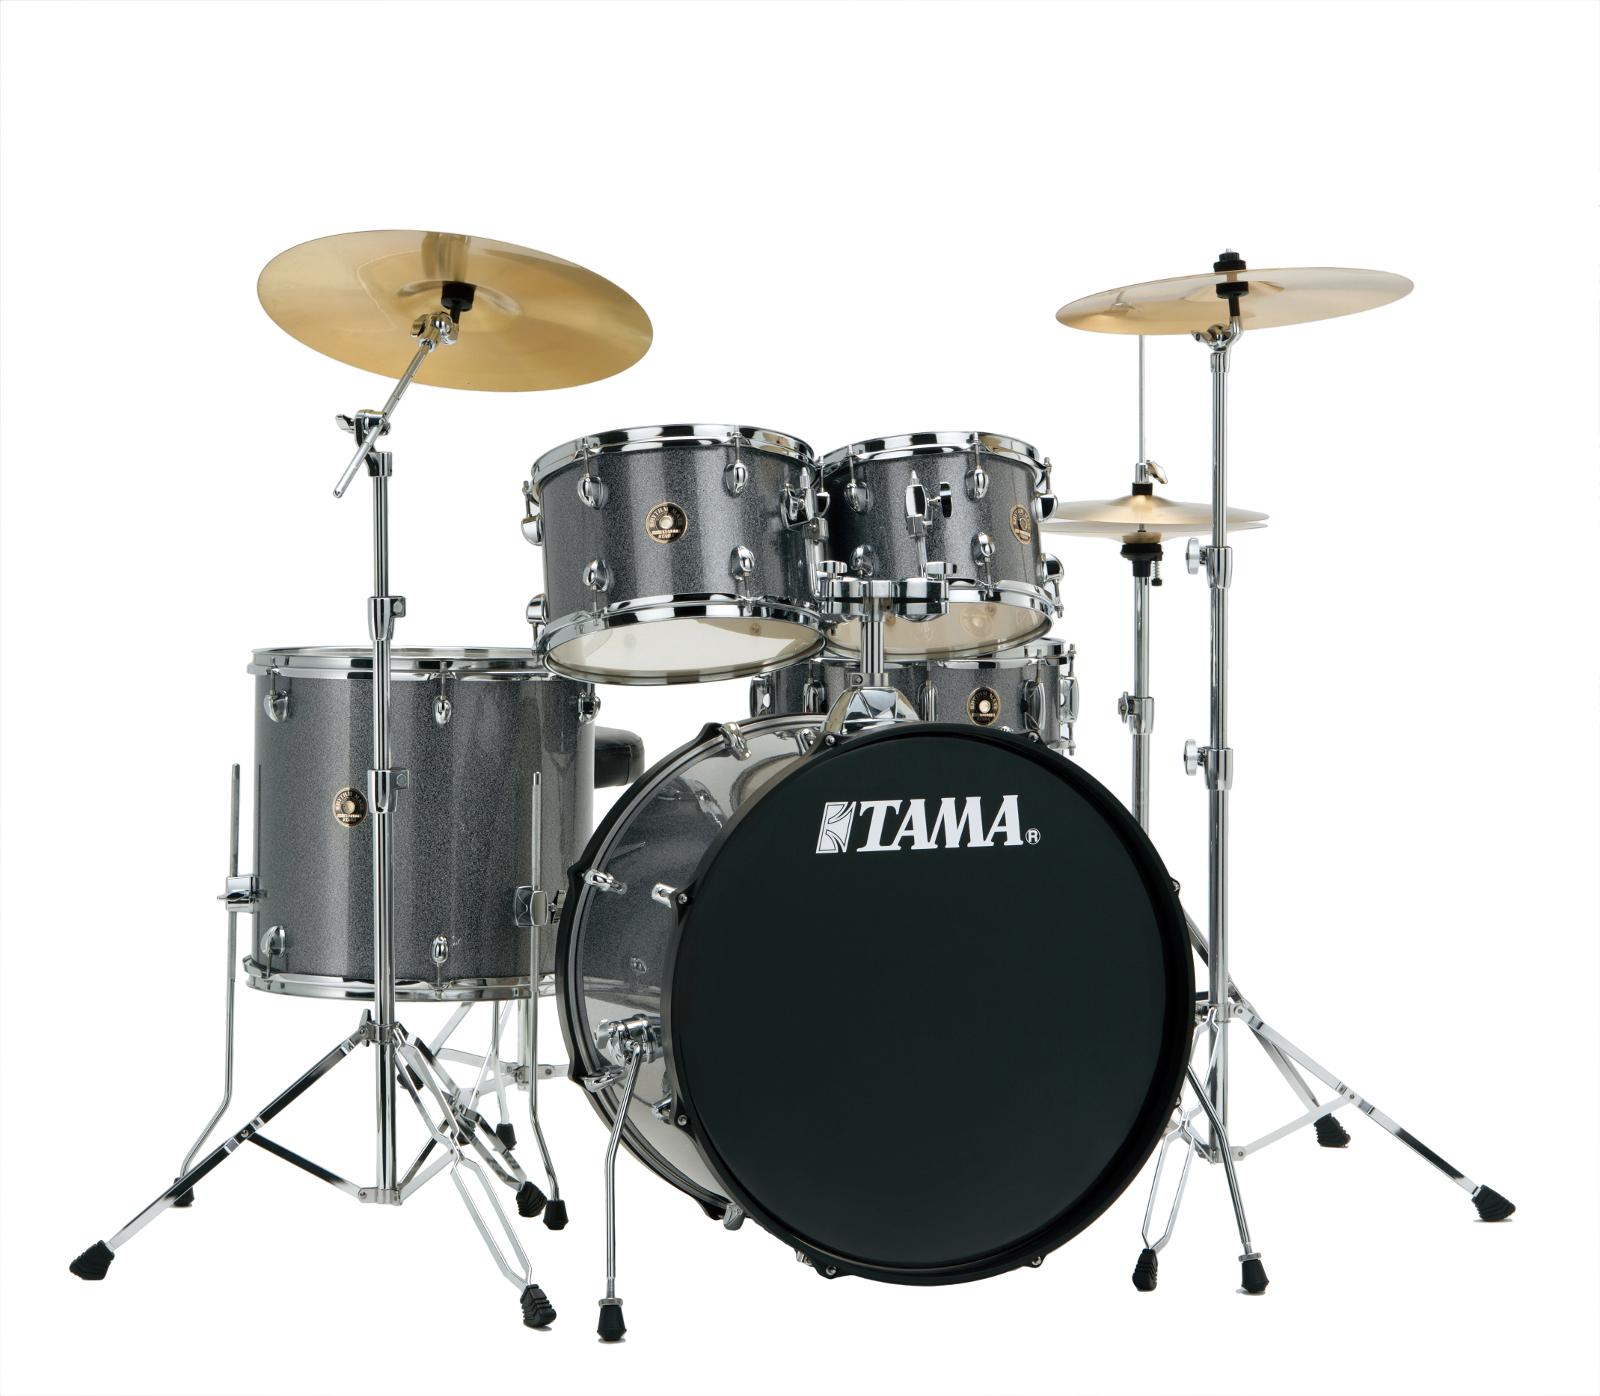 Tama Rm52kh6c-gxs - Rhythm Mate 5 Futs 22/10/12/16 Avec Hardware Et Cymbales...